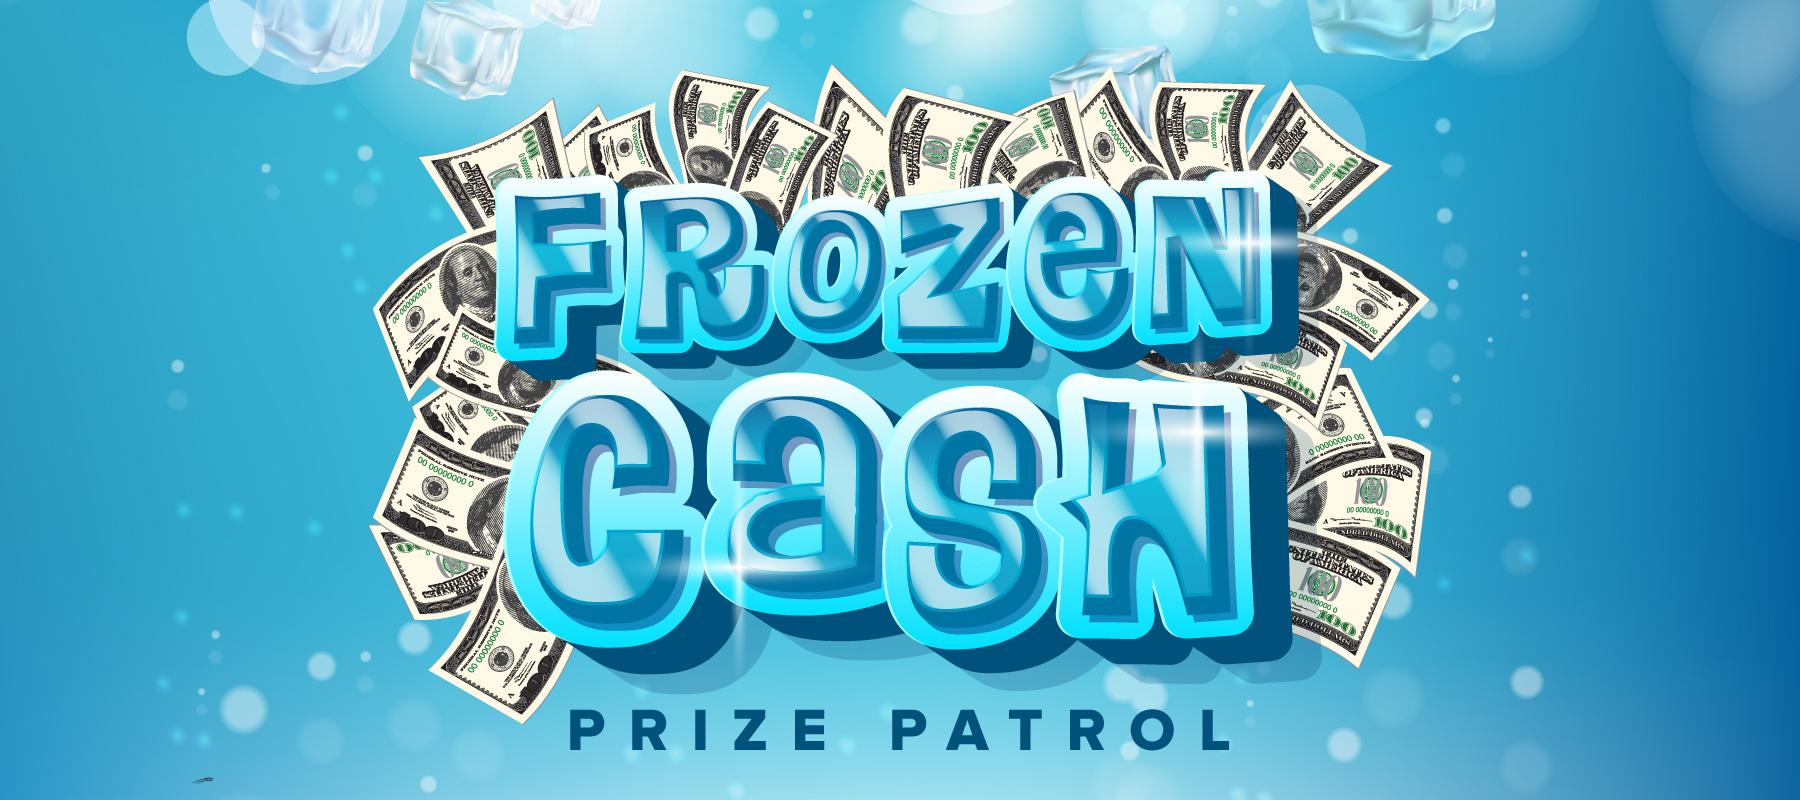 Frozen Cash Prize Patrol